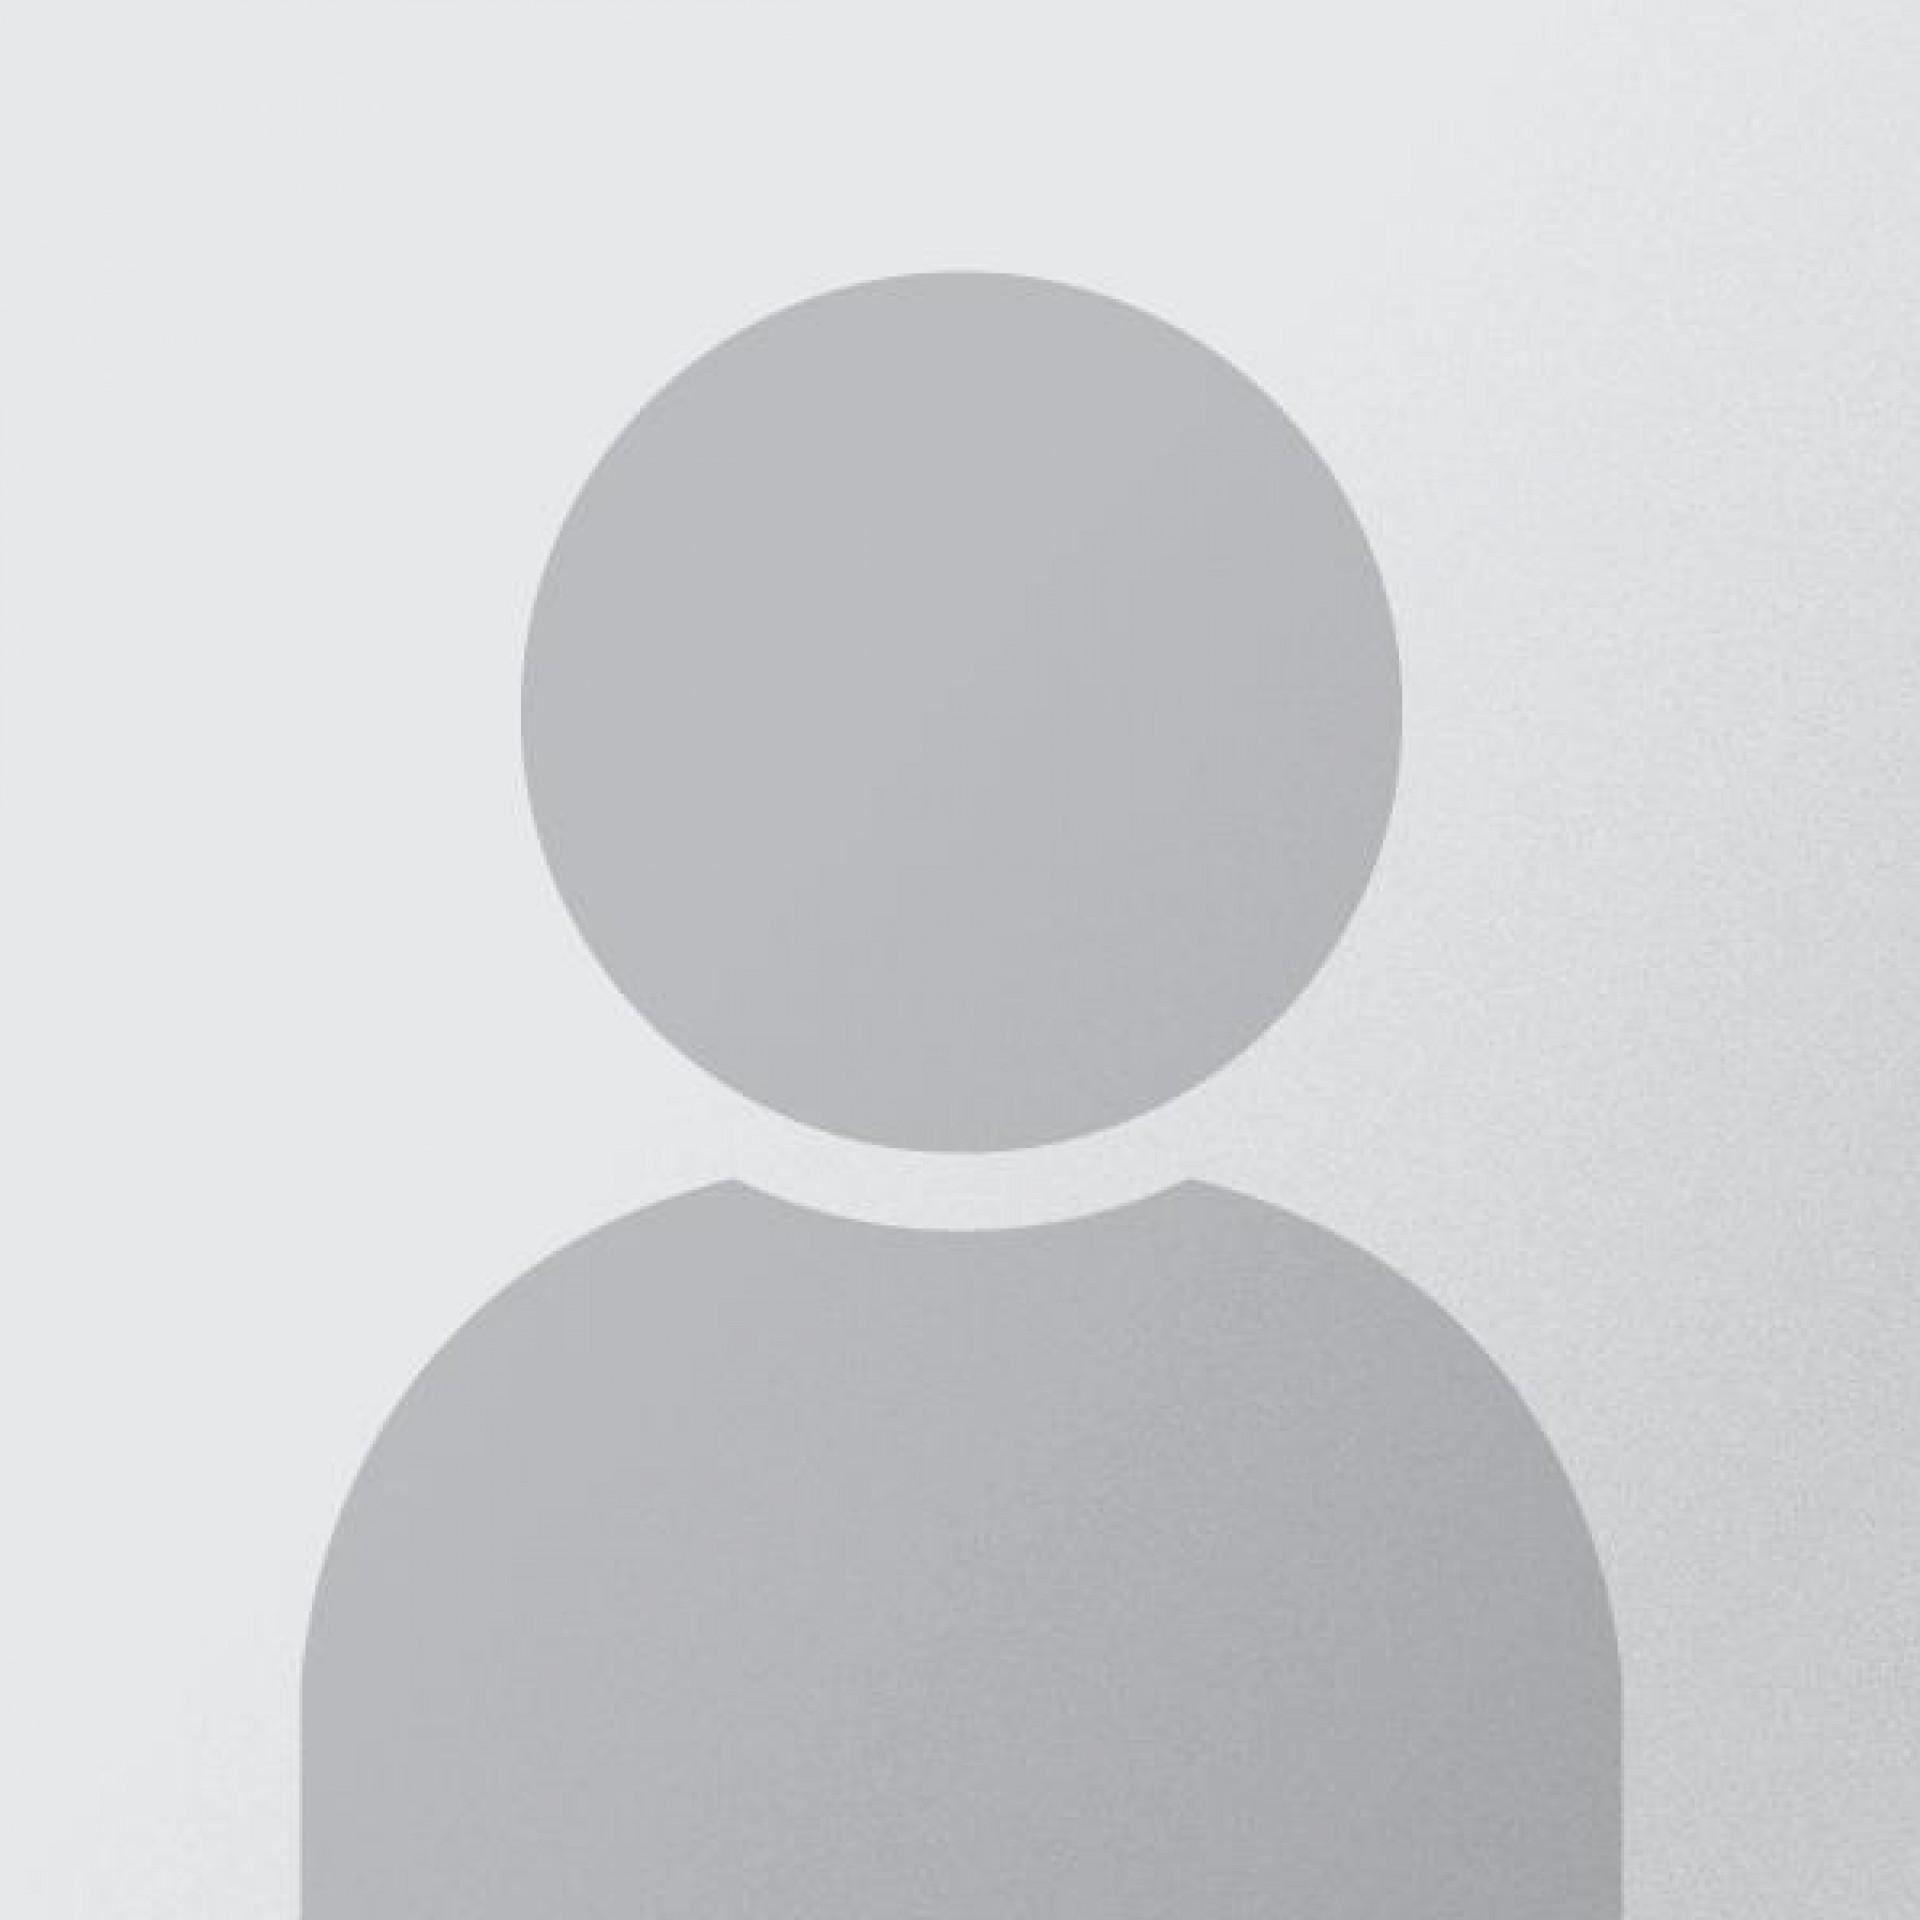 fotografia p021 profilu 01021PQR4V